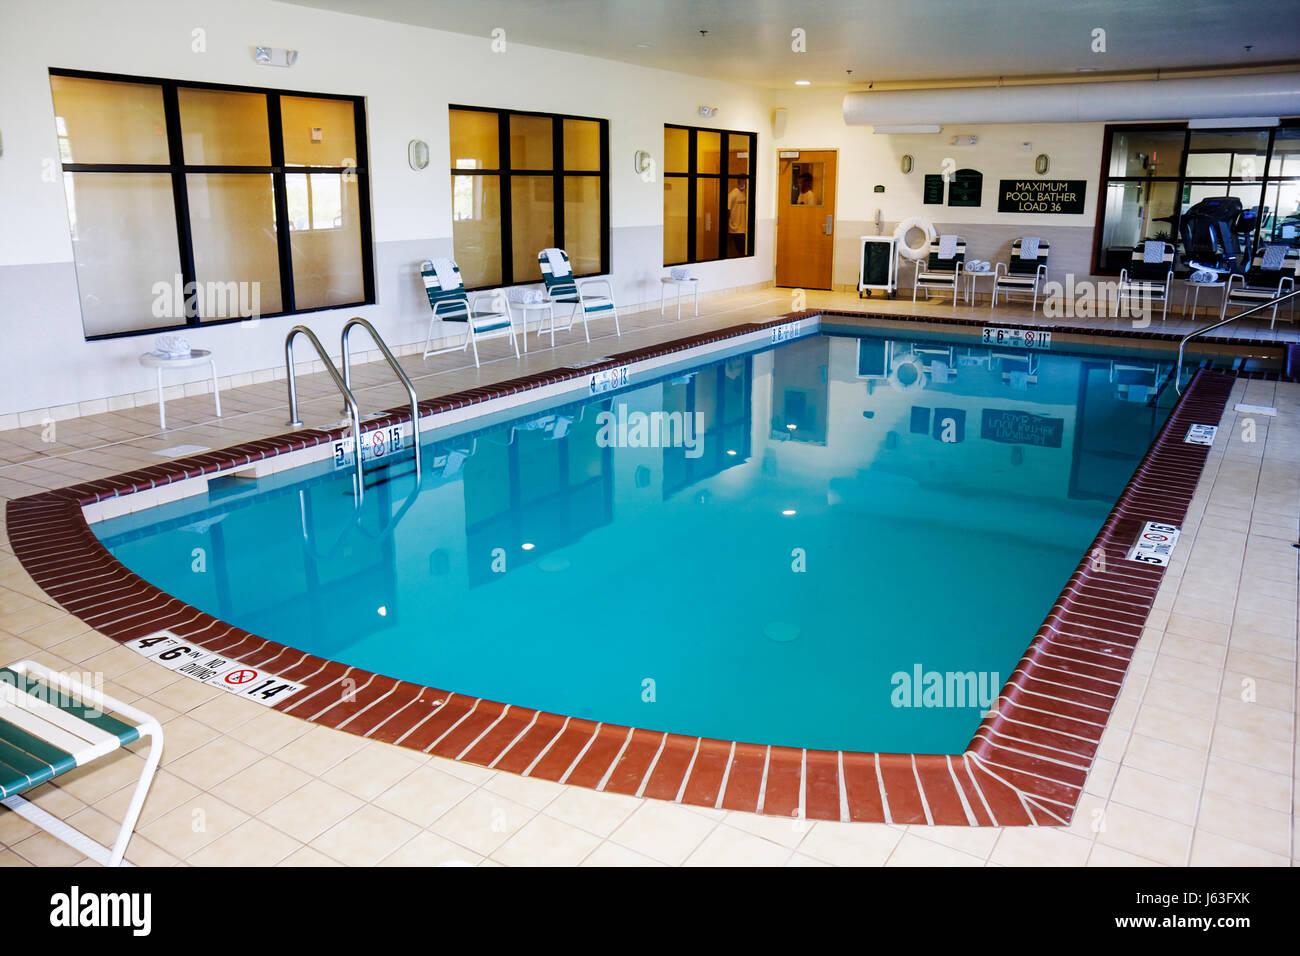 Indiana Valparaiso Holiday Inn Express motel indoor swimming pool chairs depth marker - Stock Image